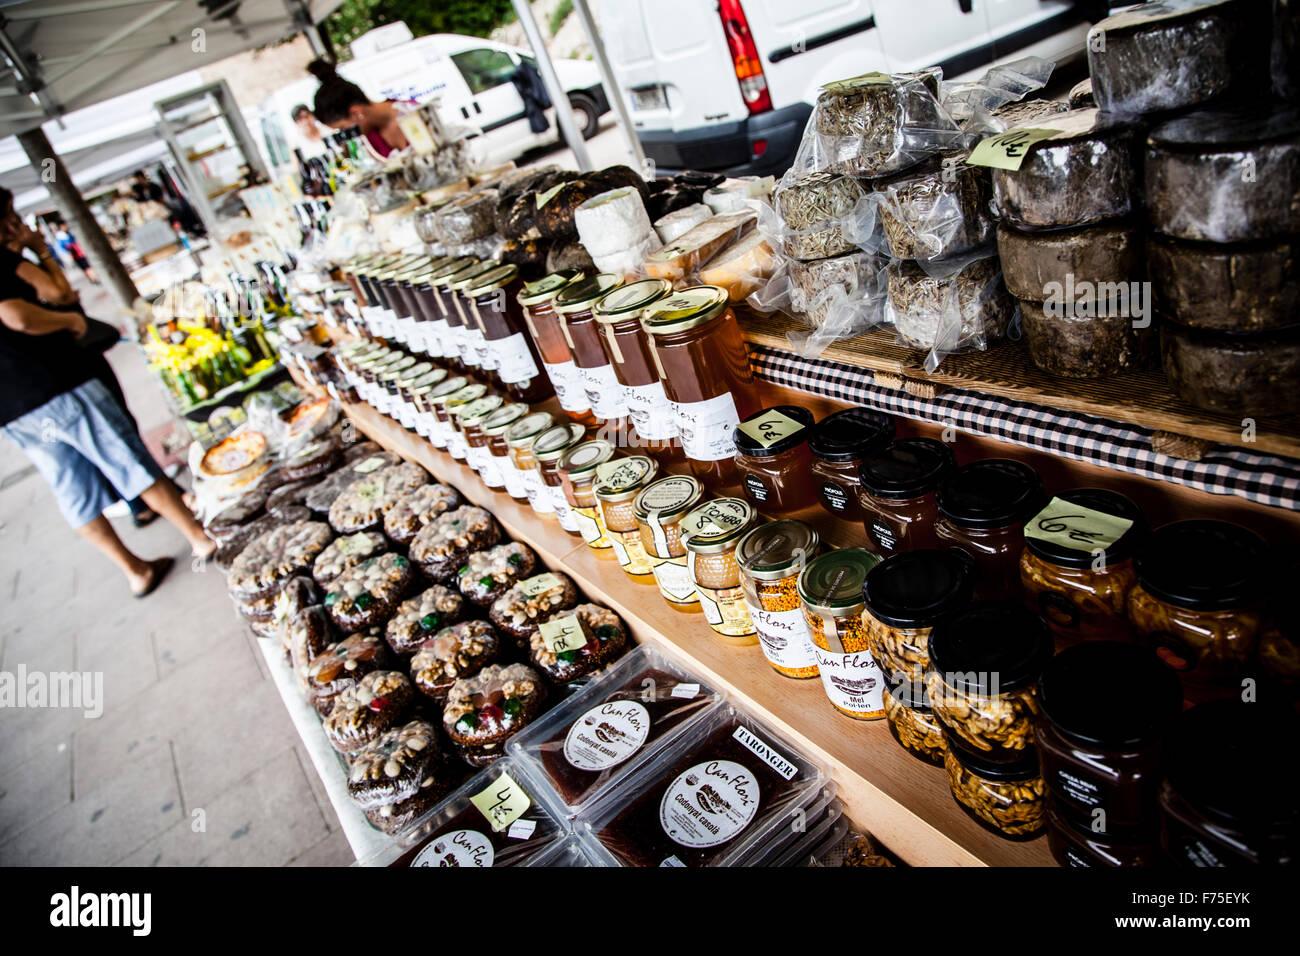 Street market at Montserrat, Barcelona, Spain Stock Photo